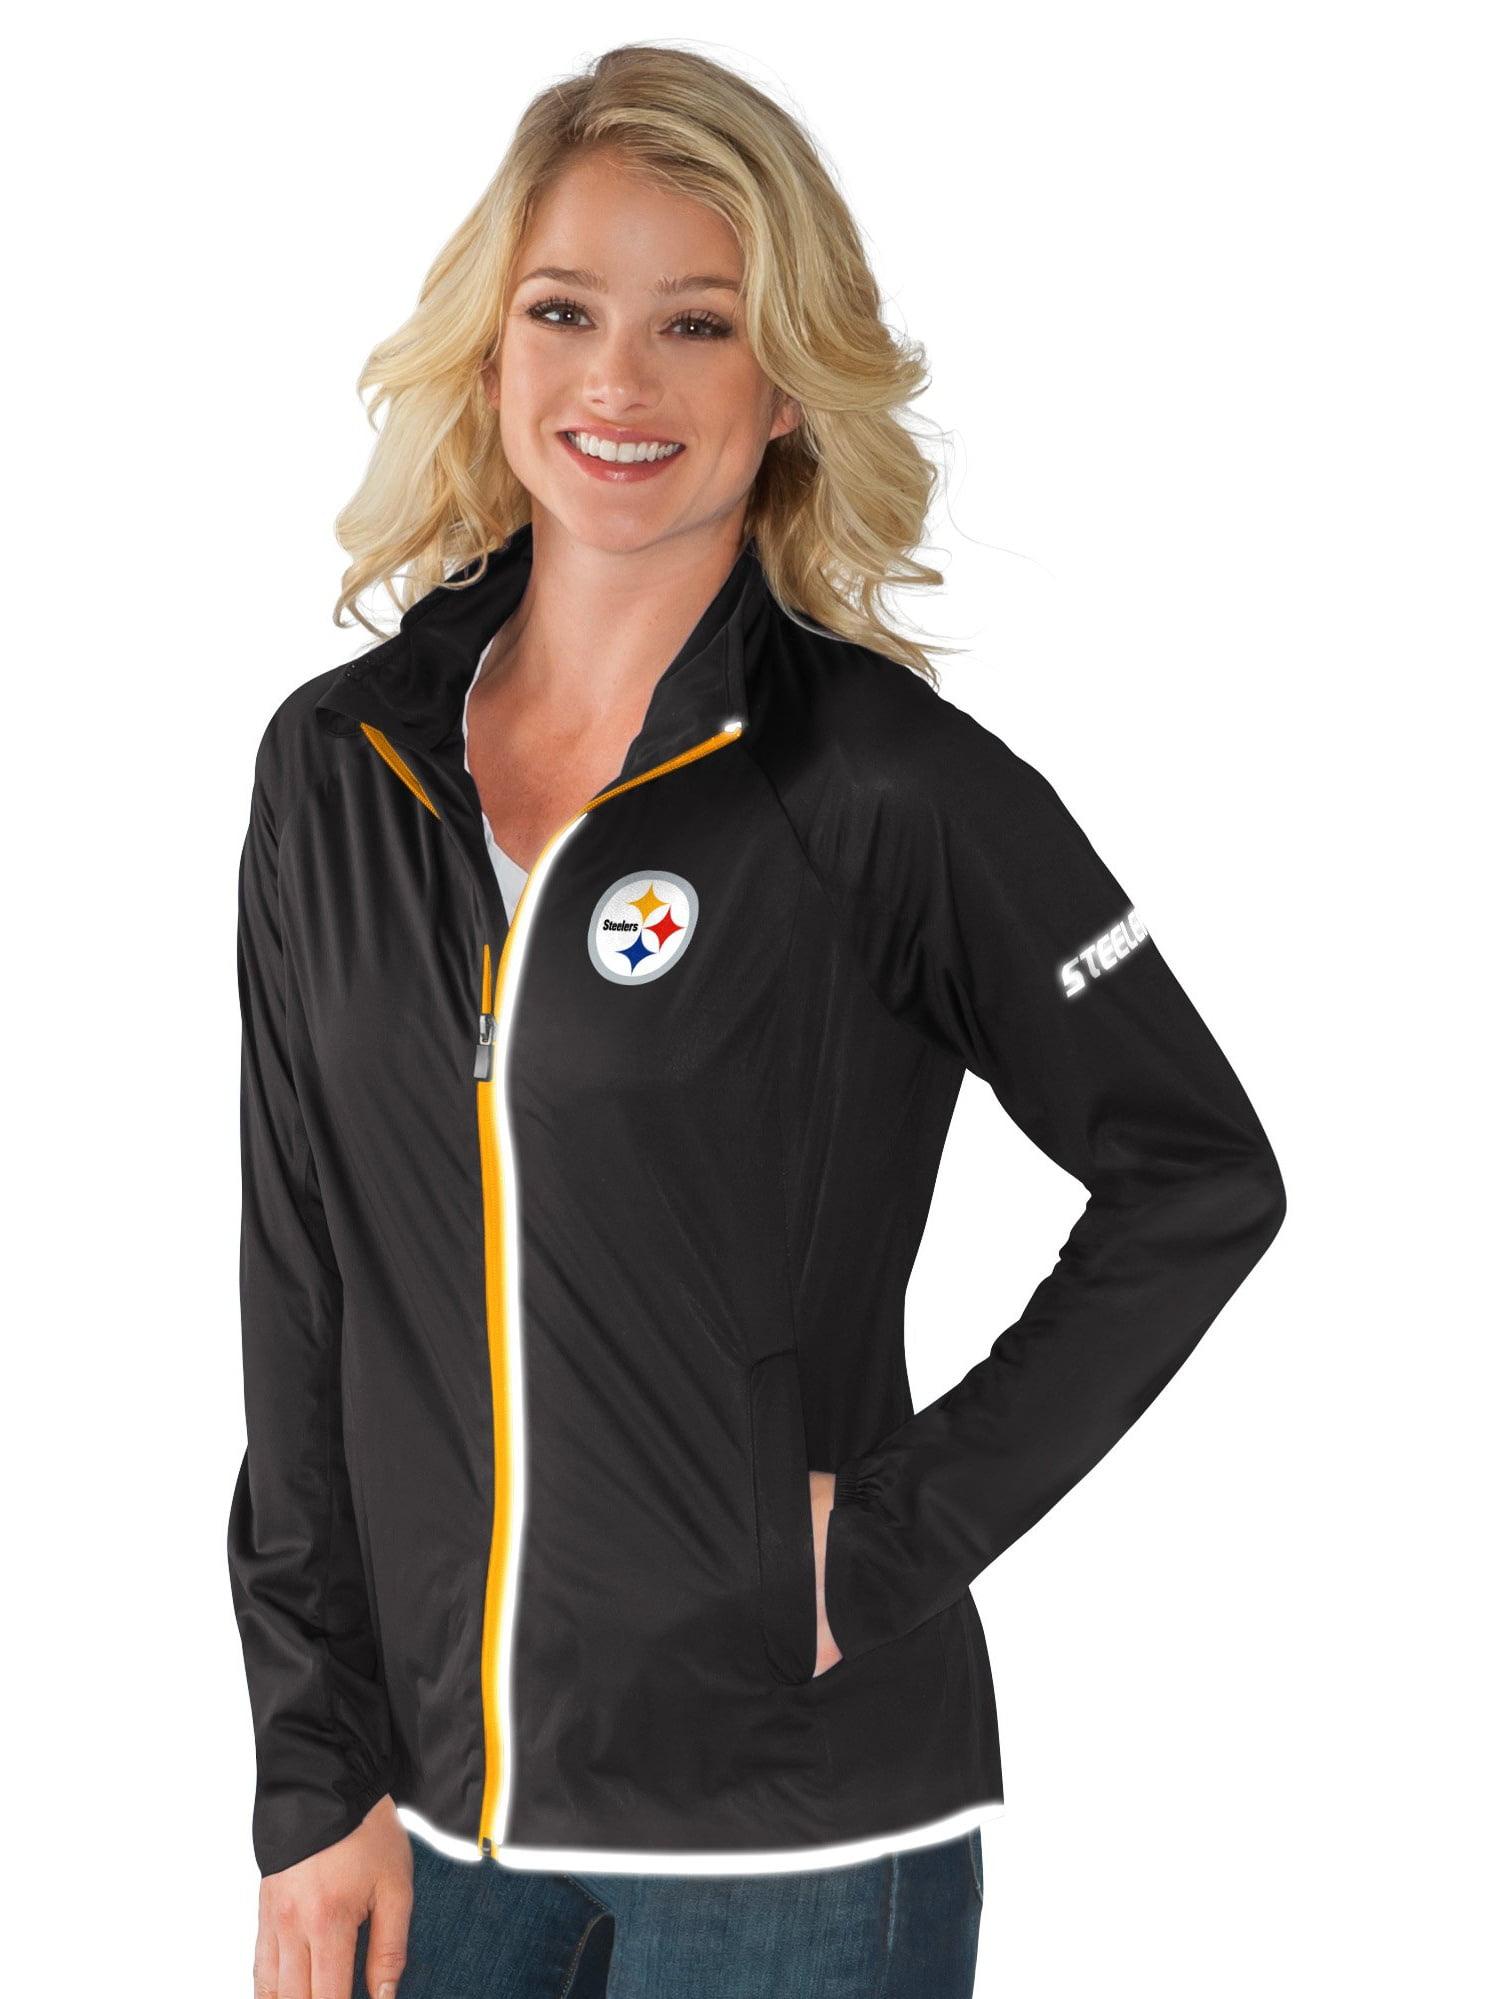 Pittsburgh Steelers Team Colors Full Zip Women's Track Jacket by G-III Sports